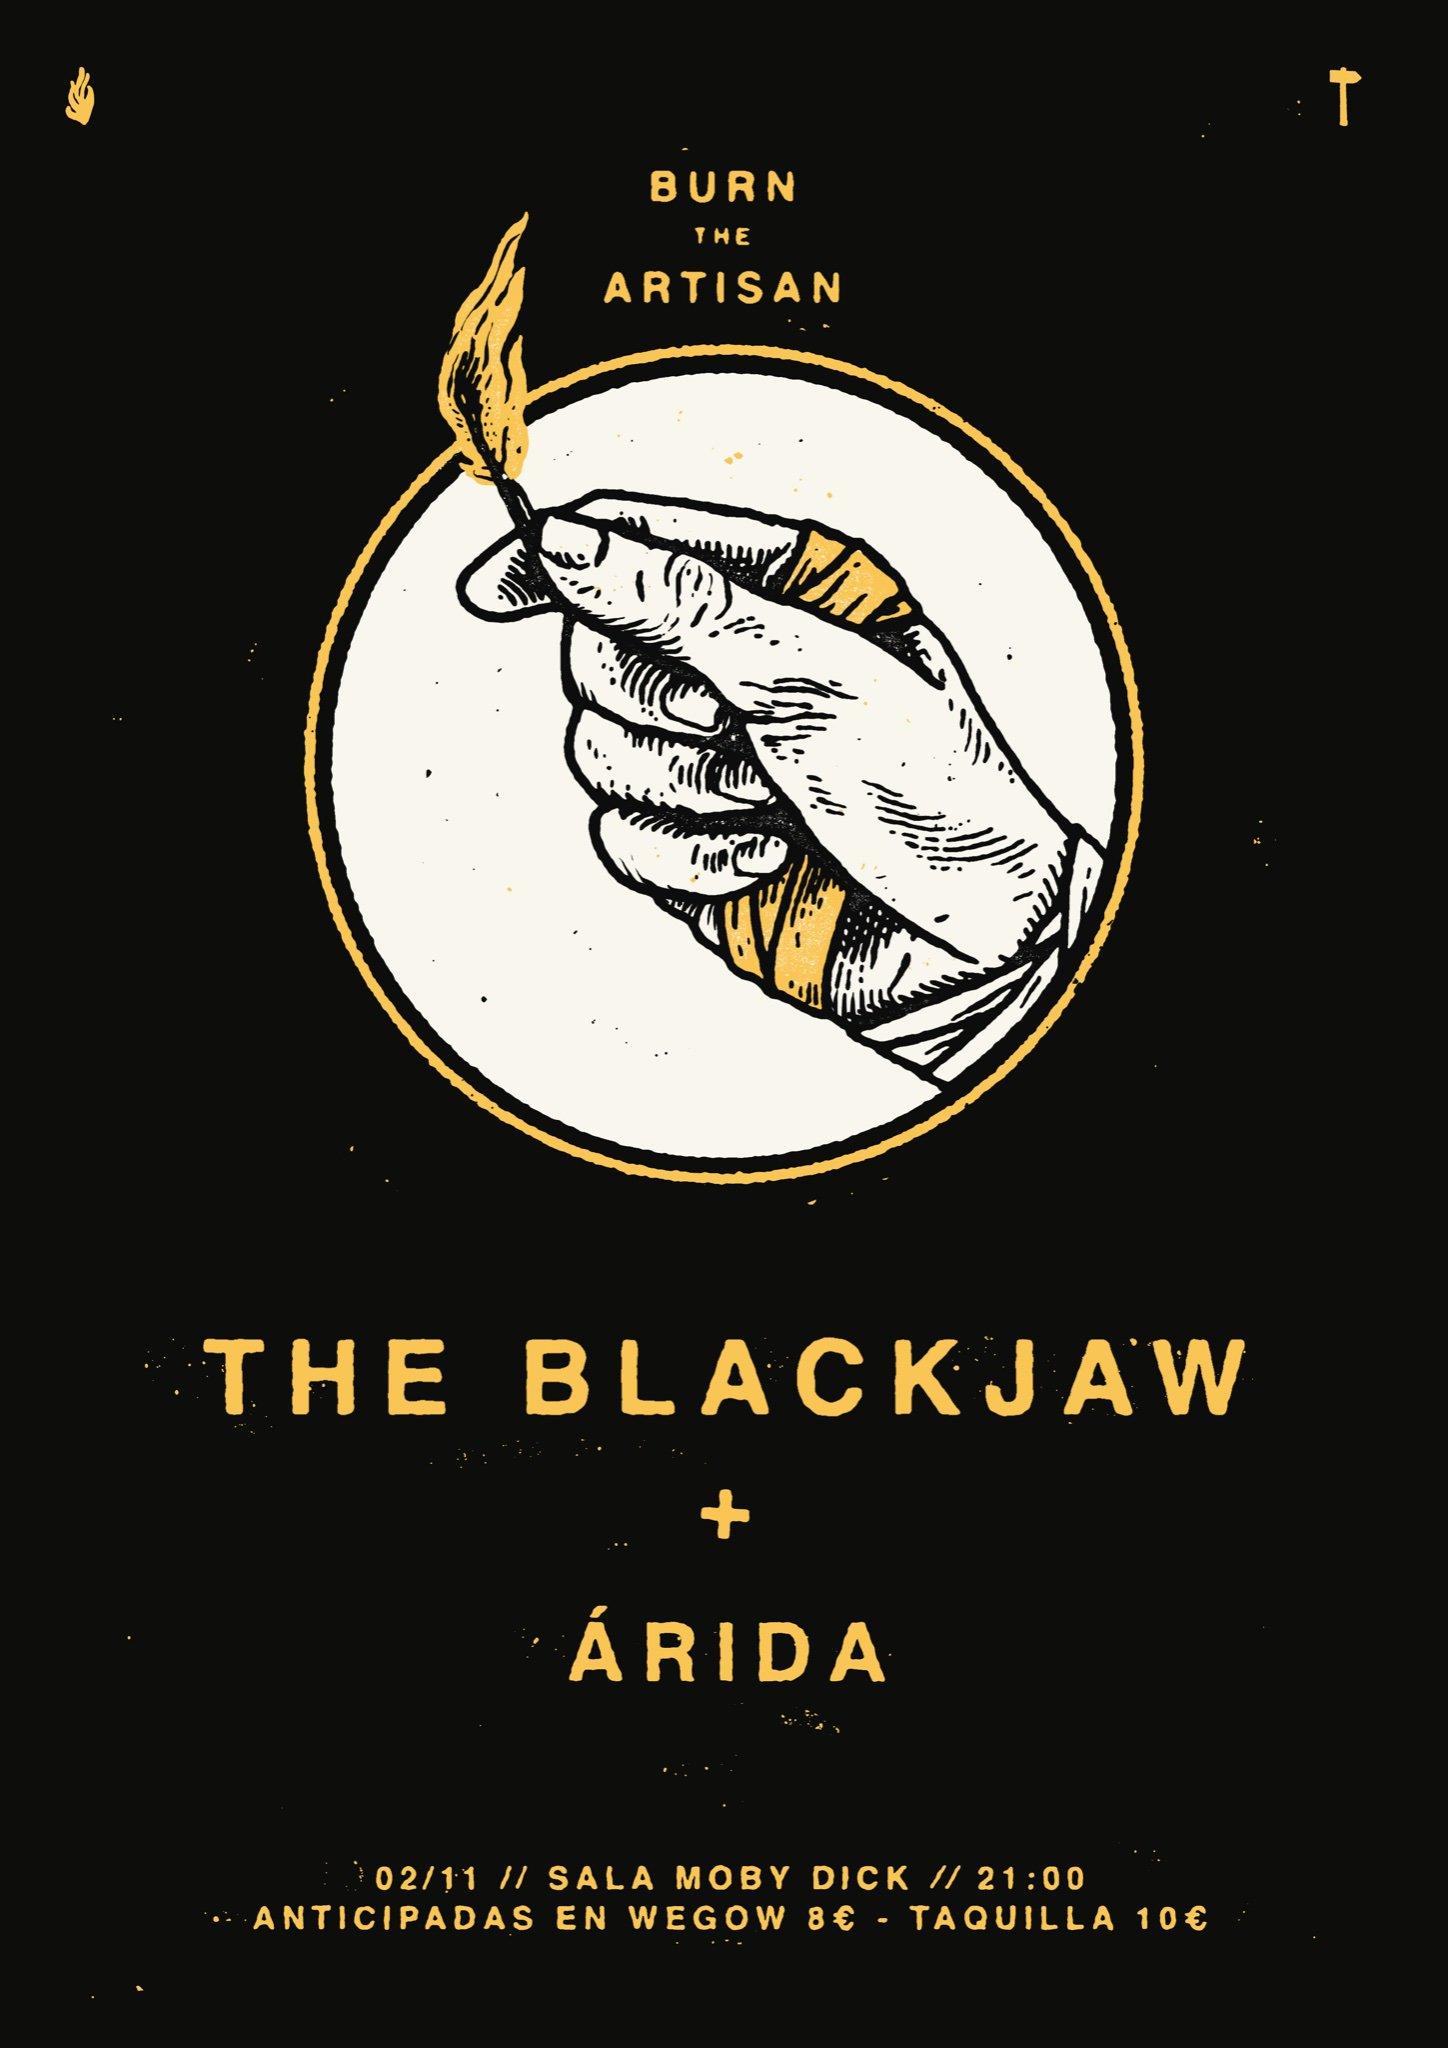 The Blackjaw - Burn The Artisan (4 de Octubre) EG1PFLiXYAYG73E?format=jpg&name=4096x4096